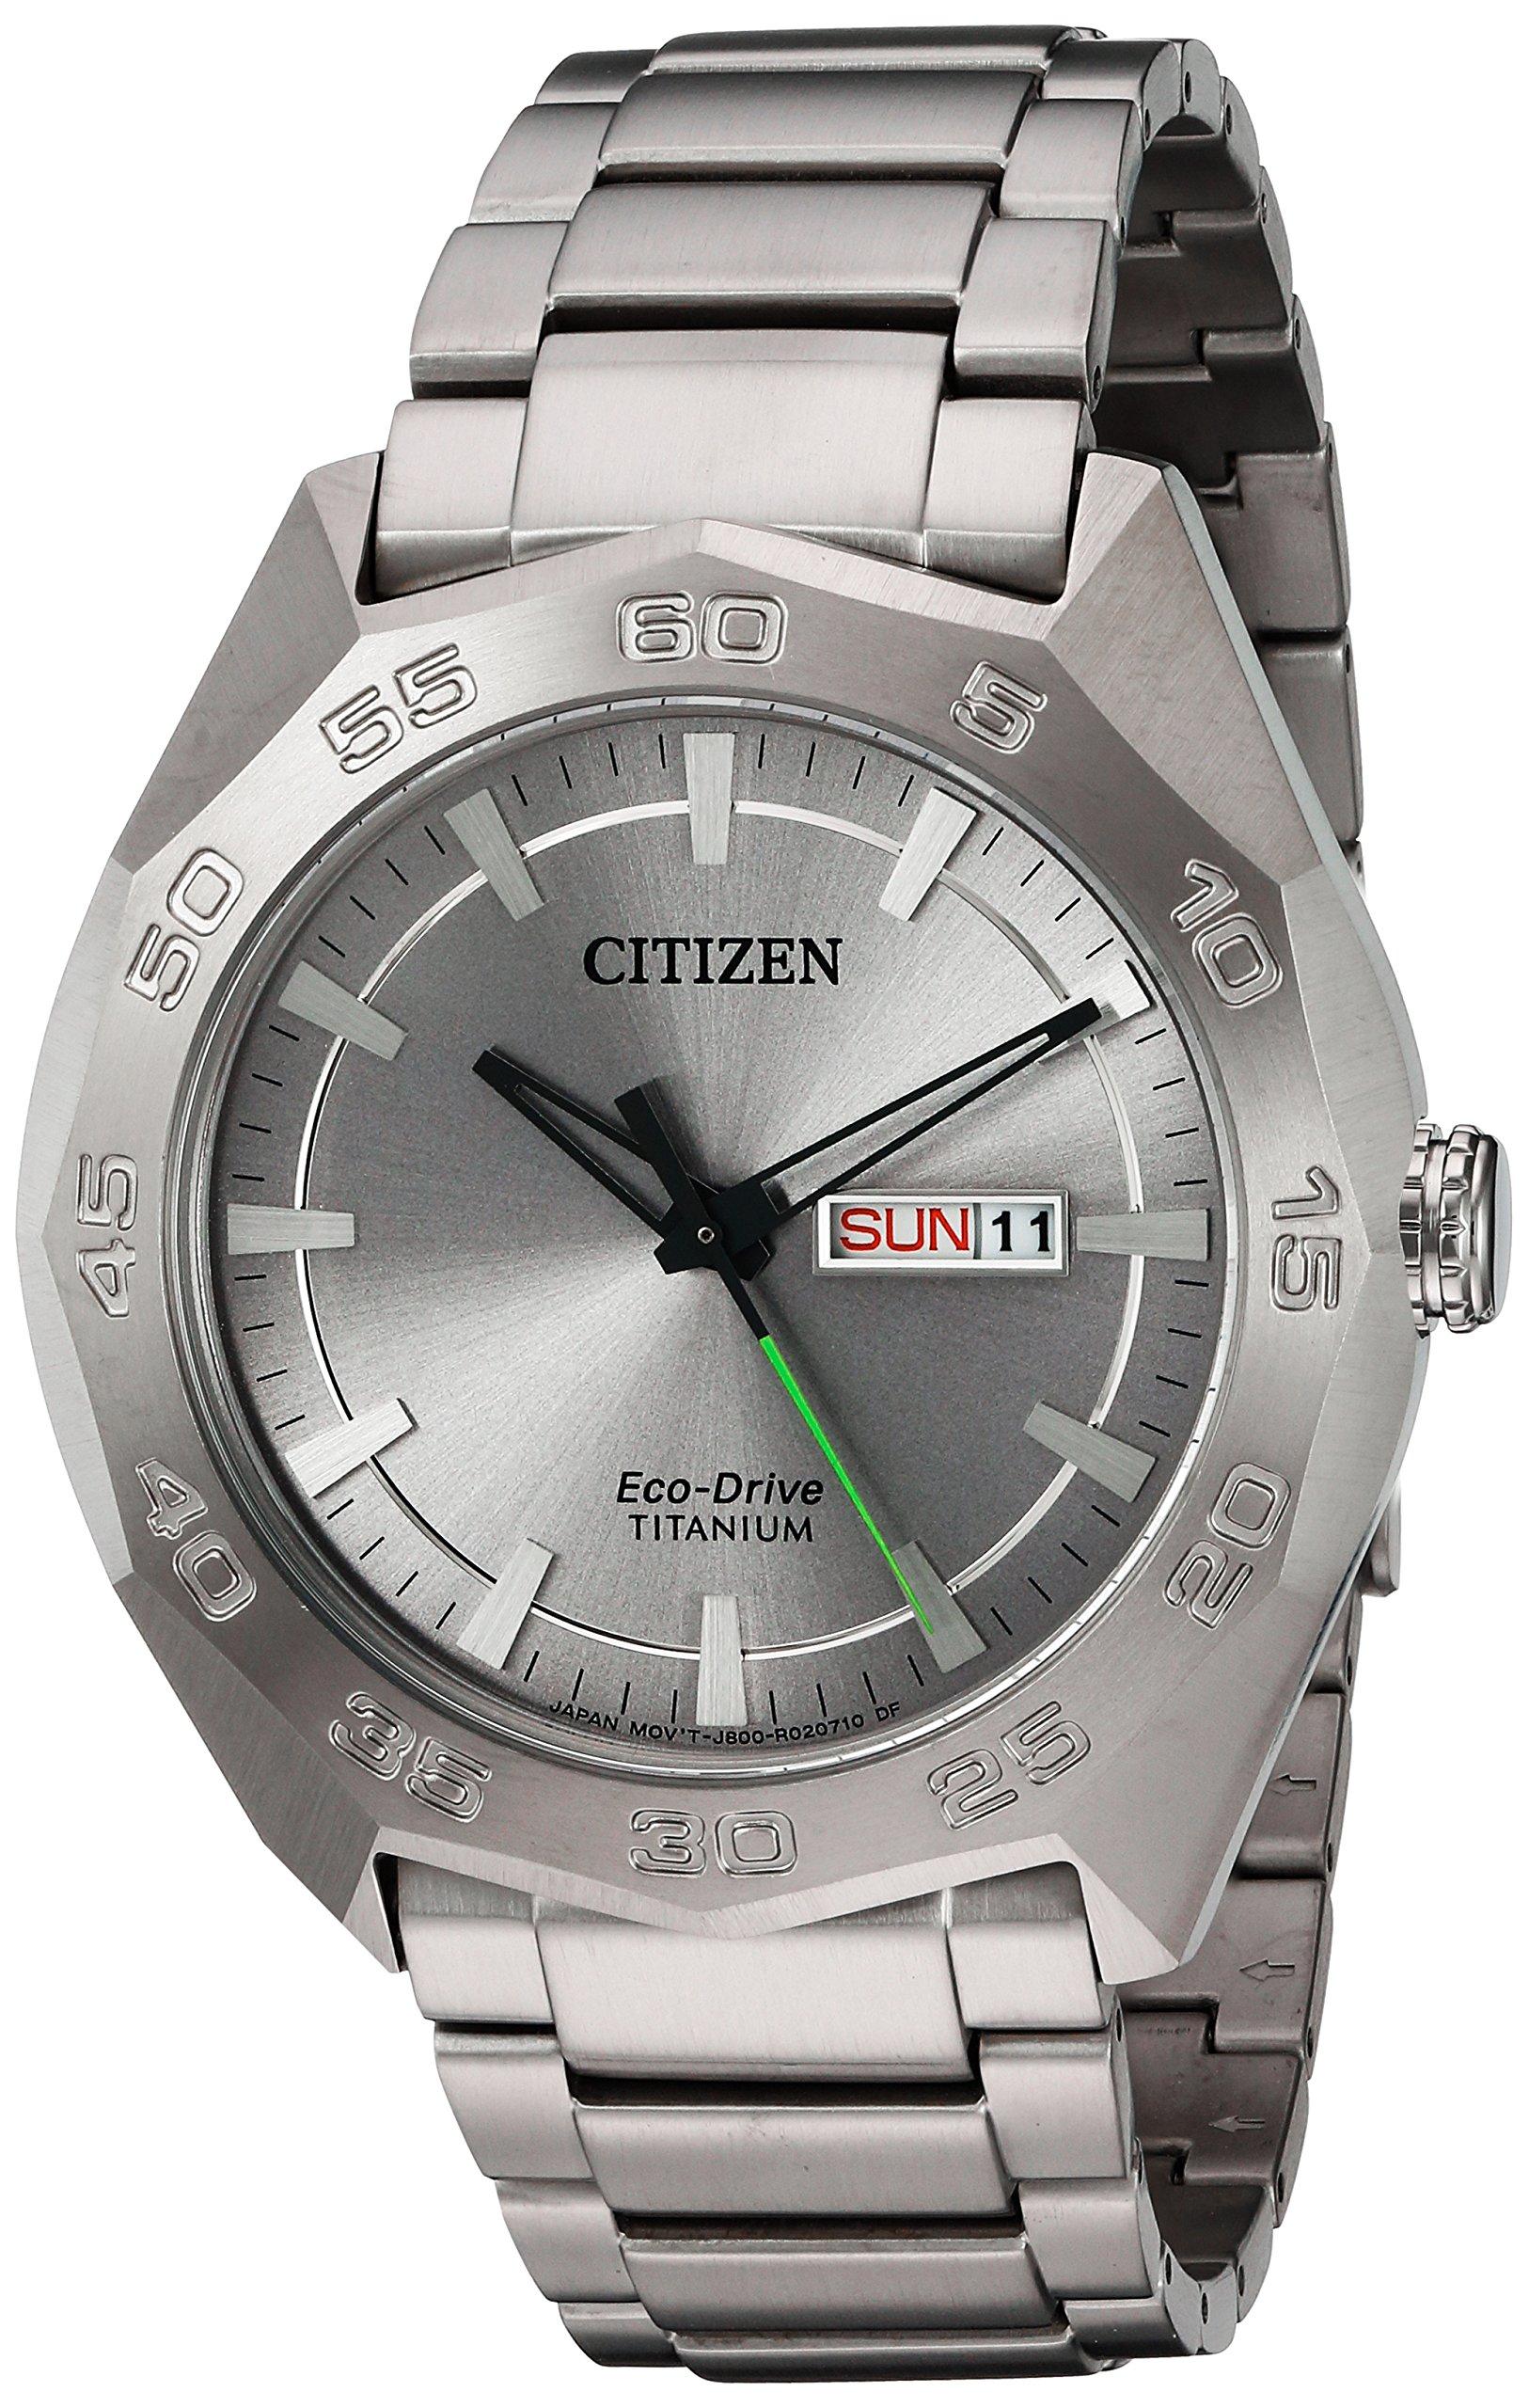 Citizen Men's 'Super' Quartz Titanium Casual Watch, Color:Silver-Toned (Model: AW0060-54A)